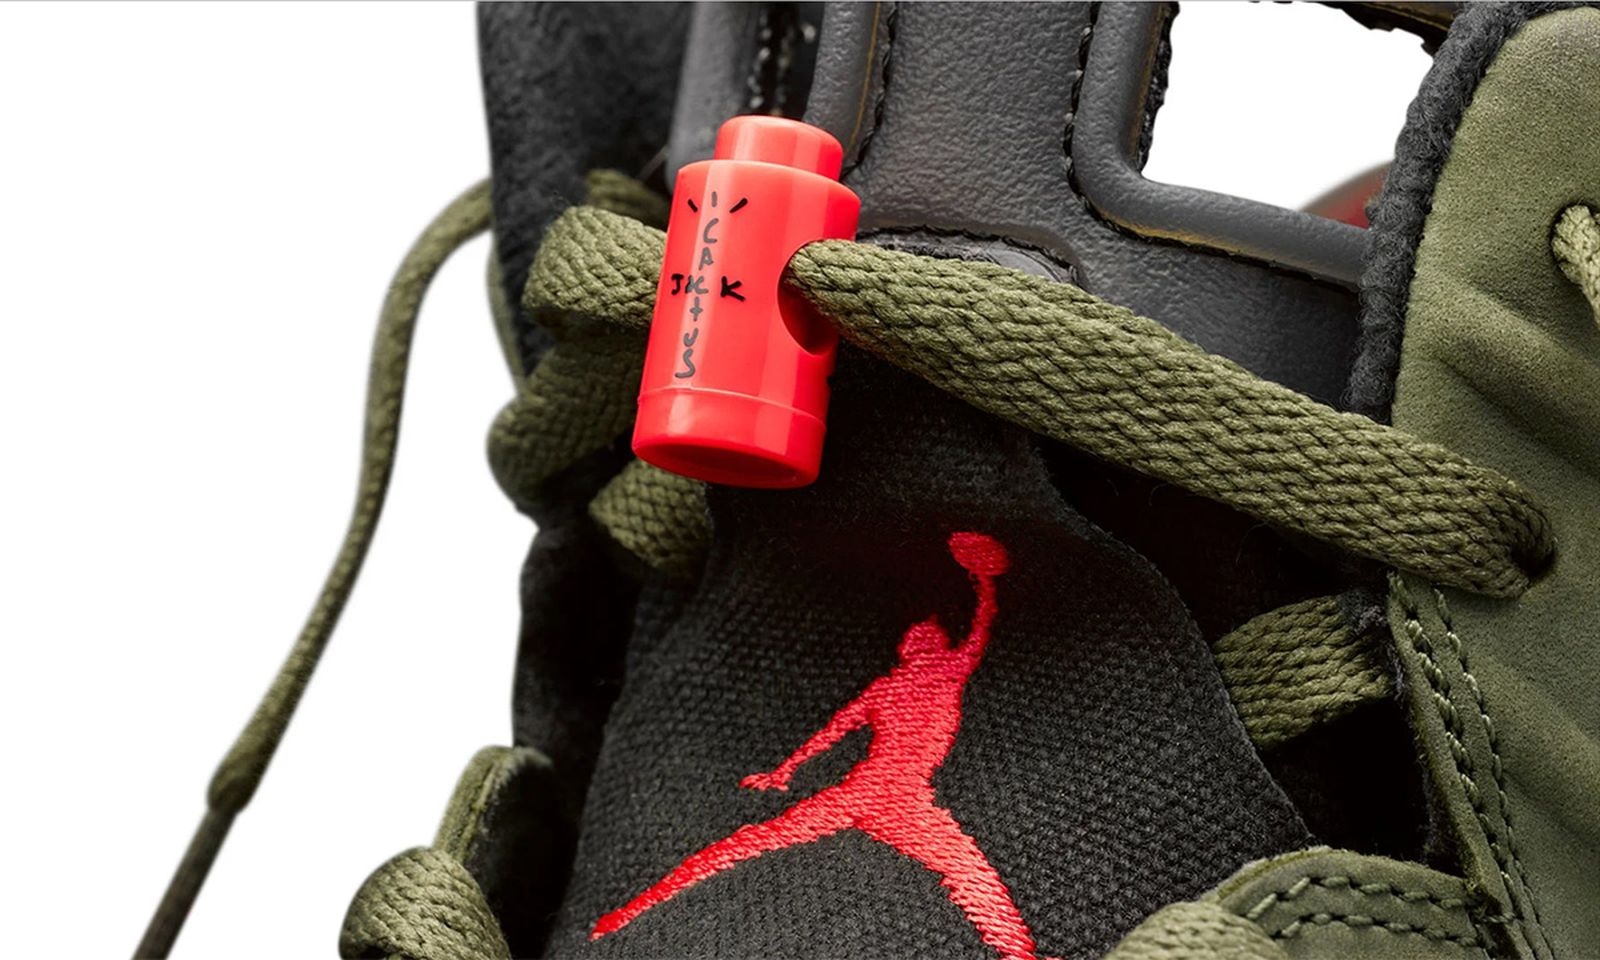 travis scott nike Nike Air Jordan 6 jordan brand